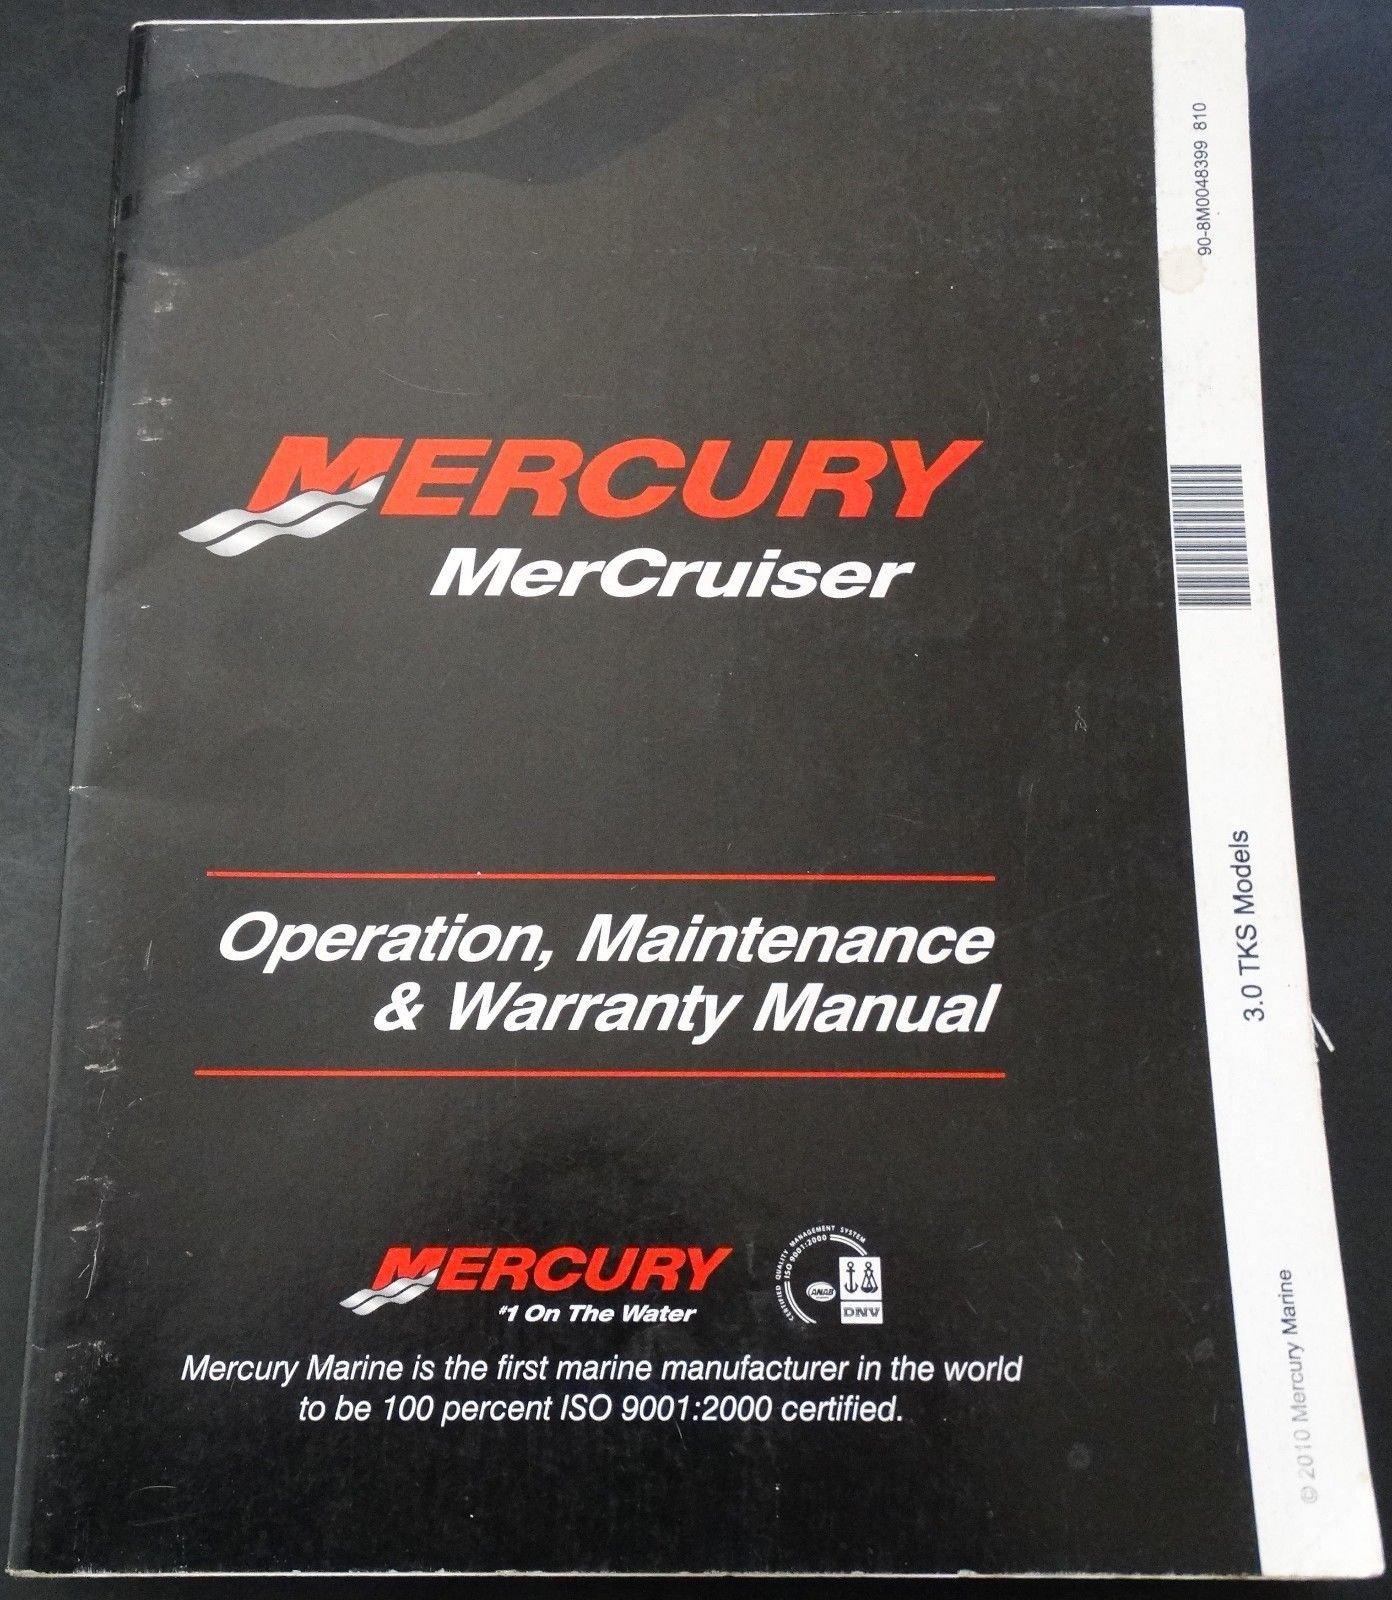 2011 MERCURY MERCRUISER 3.0 TKS OPERATORS MANUAL 90-8M0048399 (210): MERCURY:  Amazon.com: Books